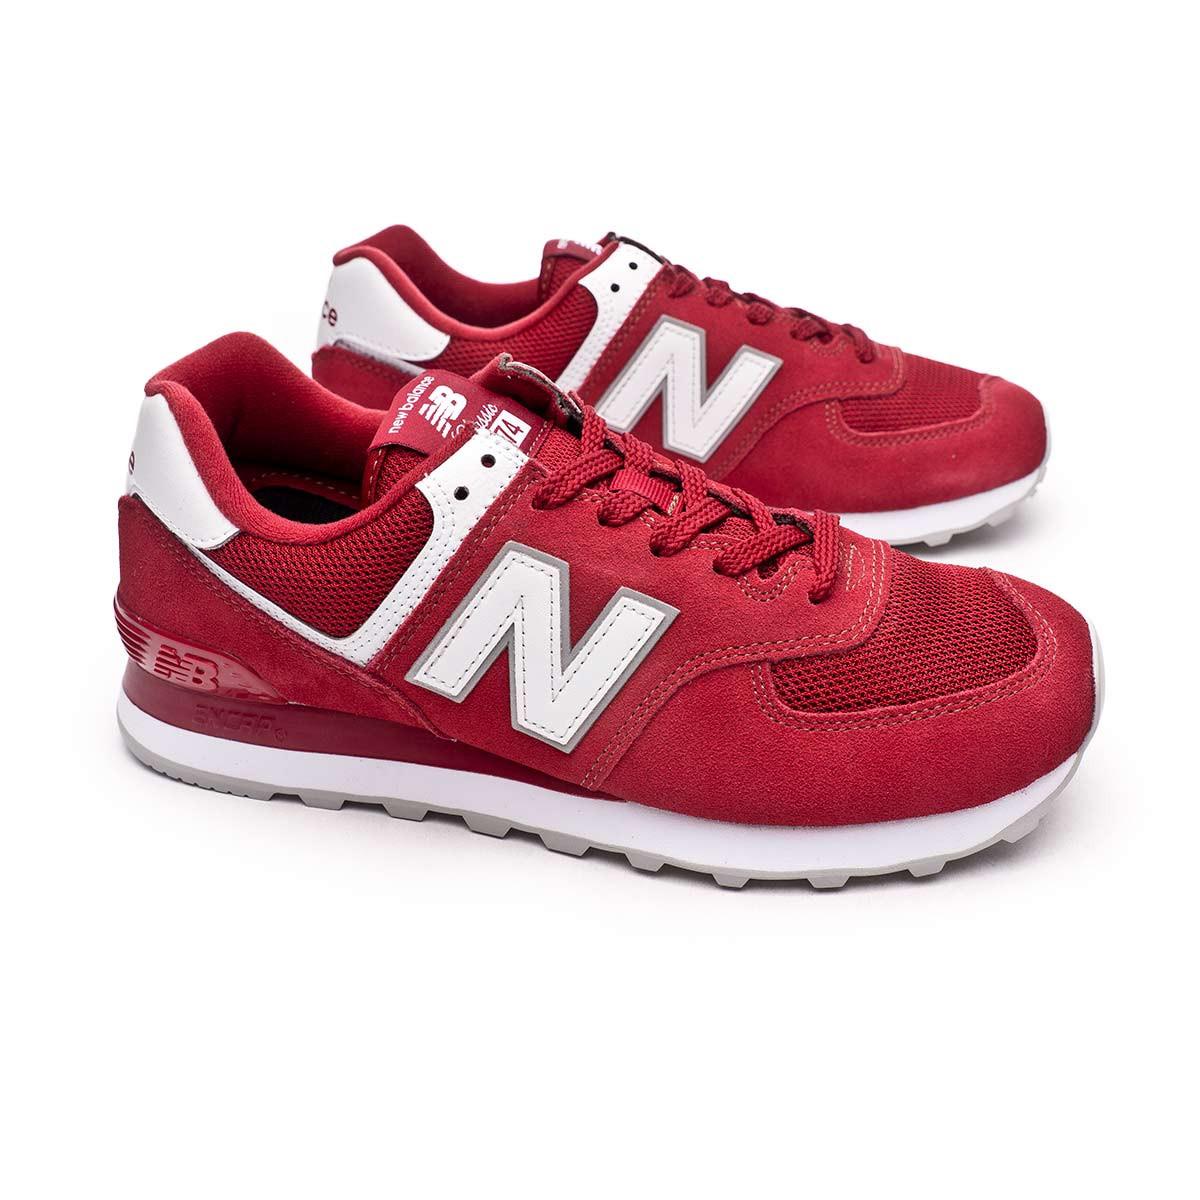 Trainers New Balance Classic Running 574 v2 Scarlet - Fútbol Emotion